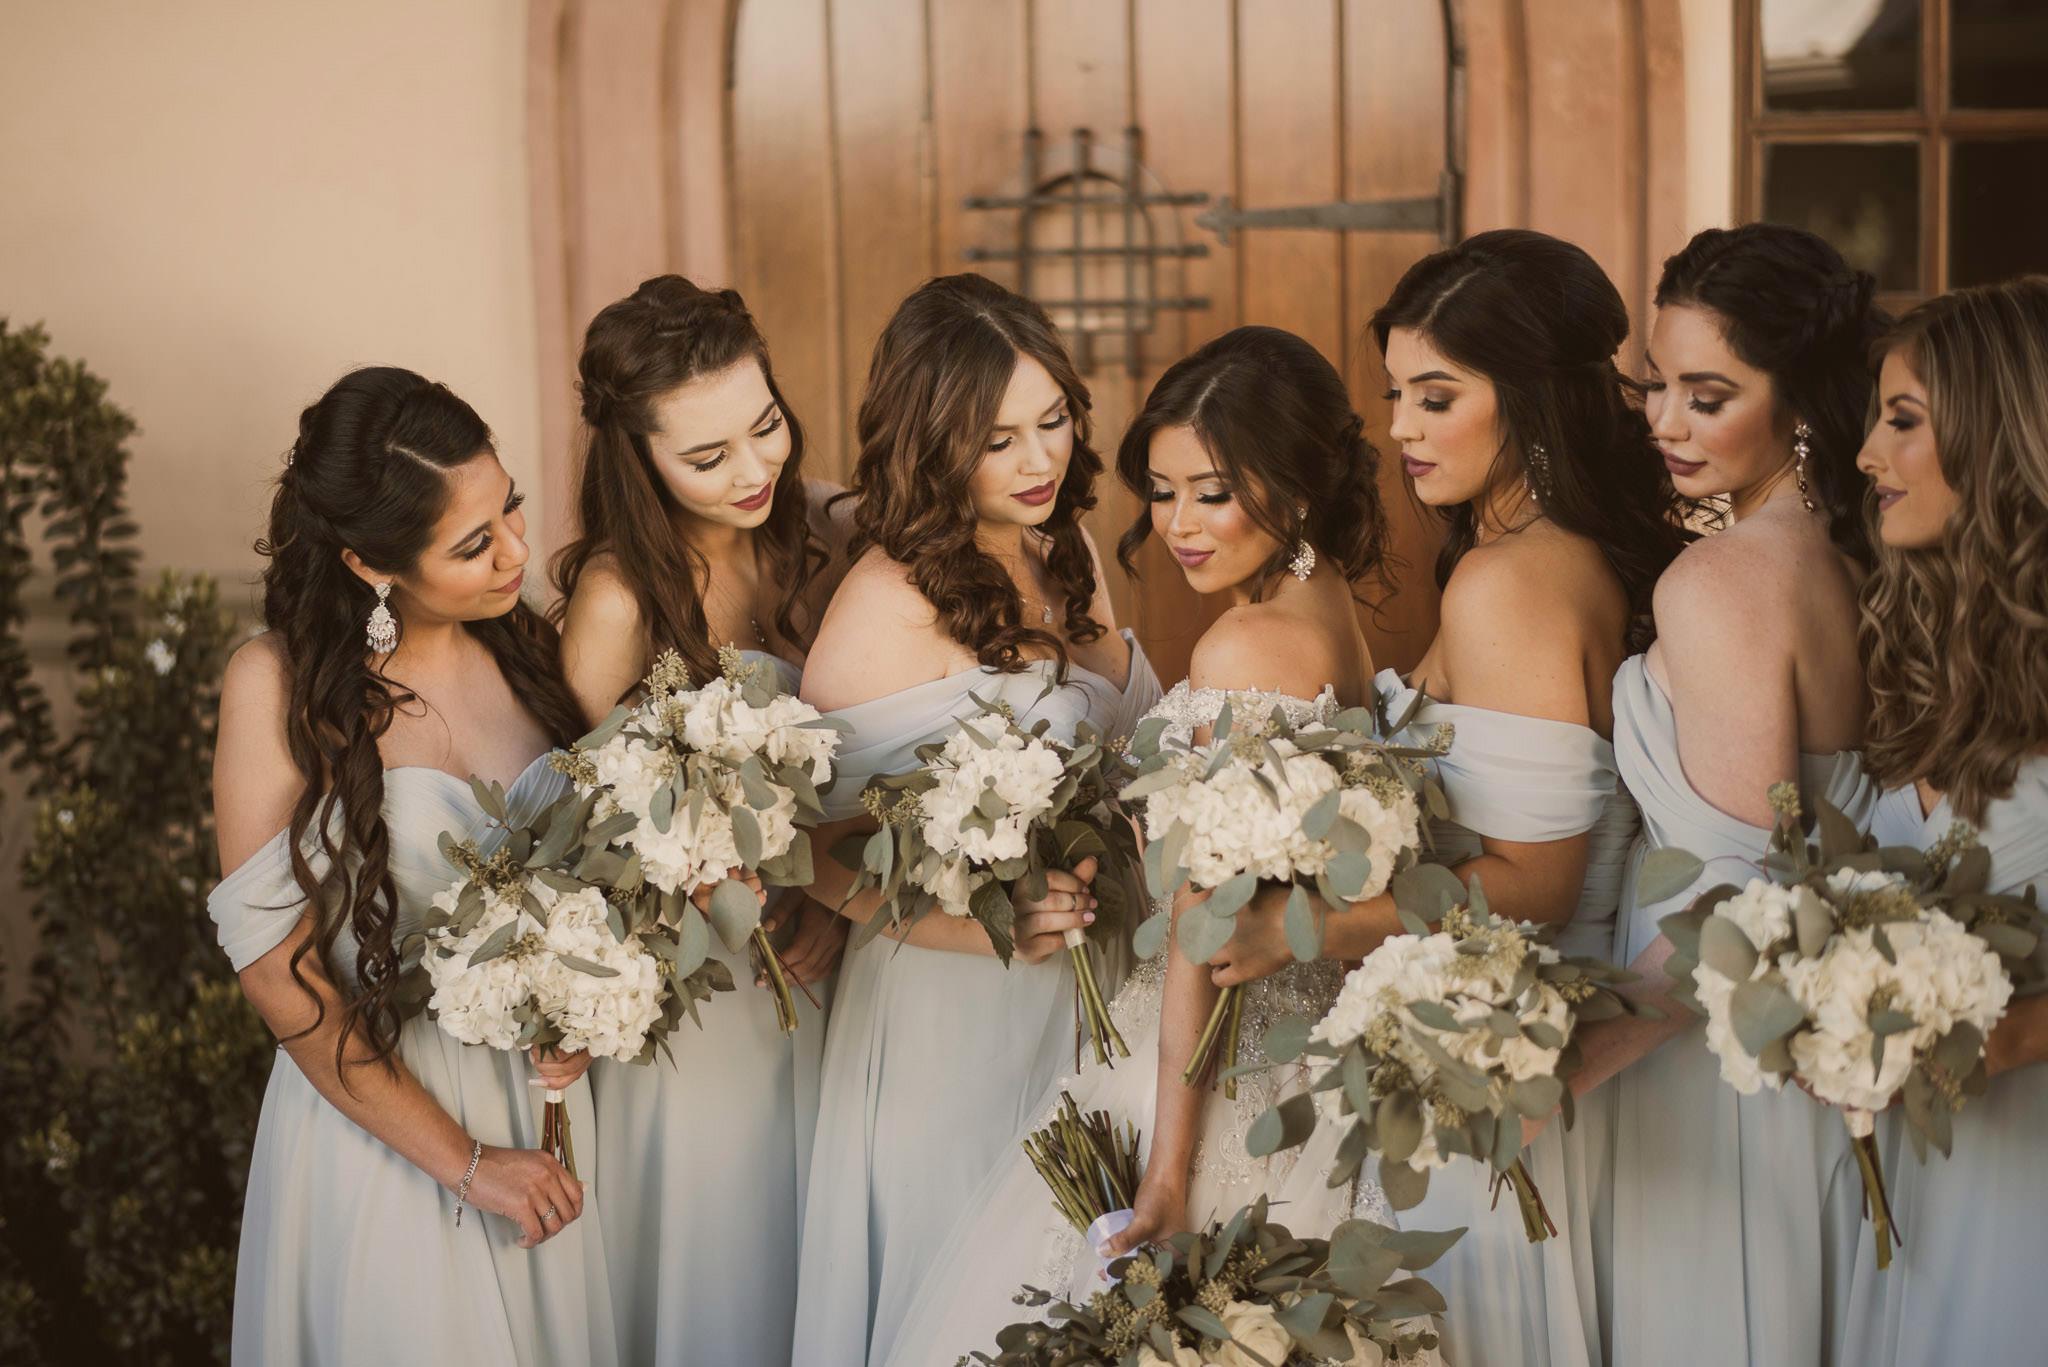 bridesmaids-houston-texas-photography-1.jpg